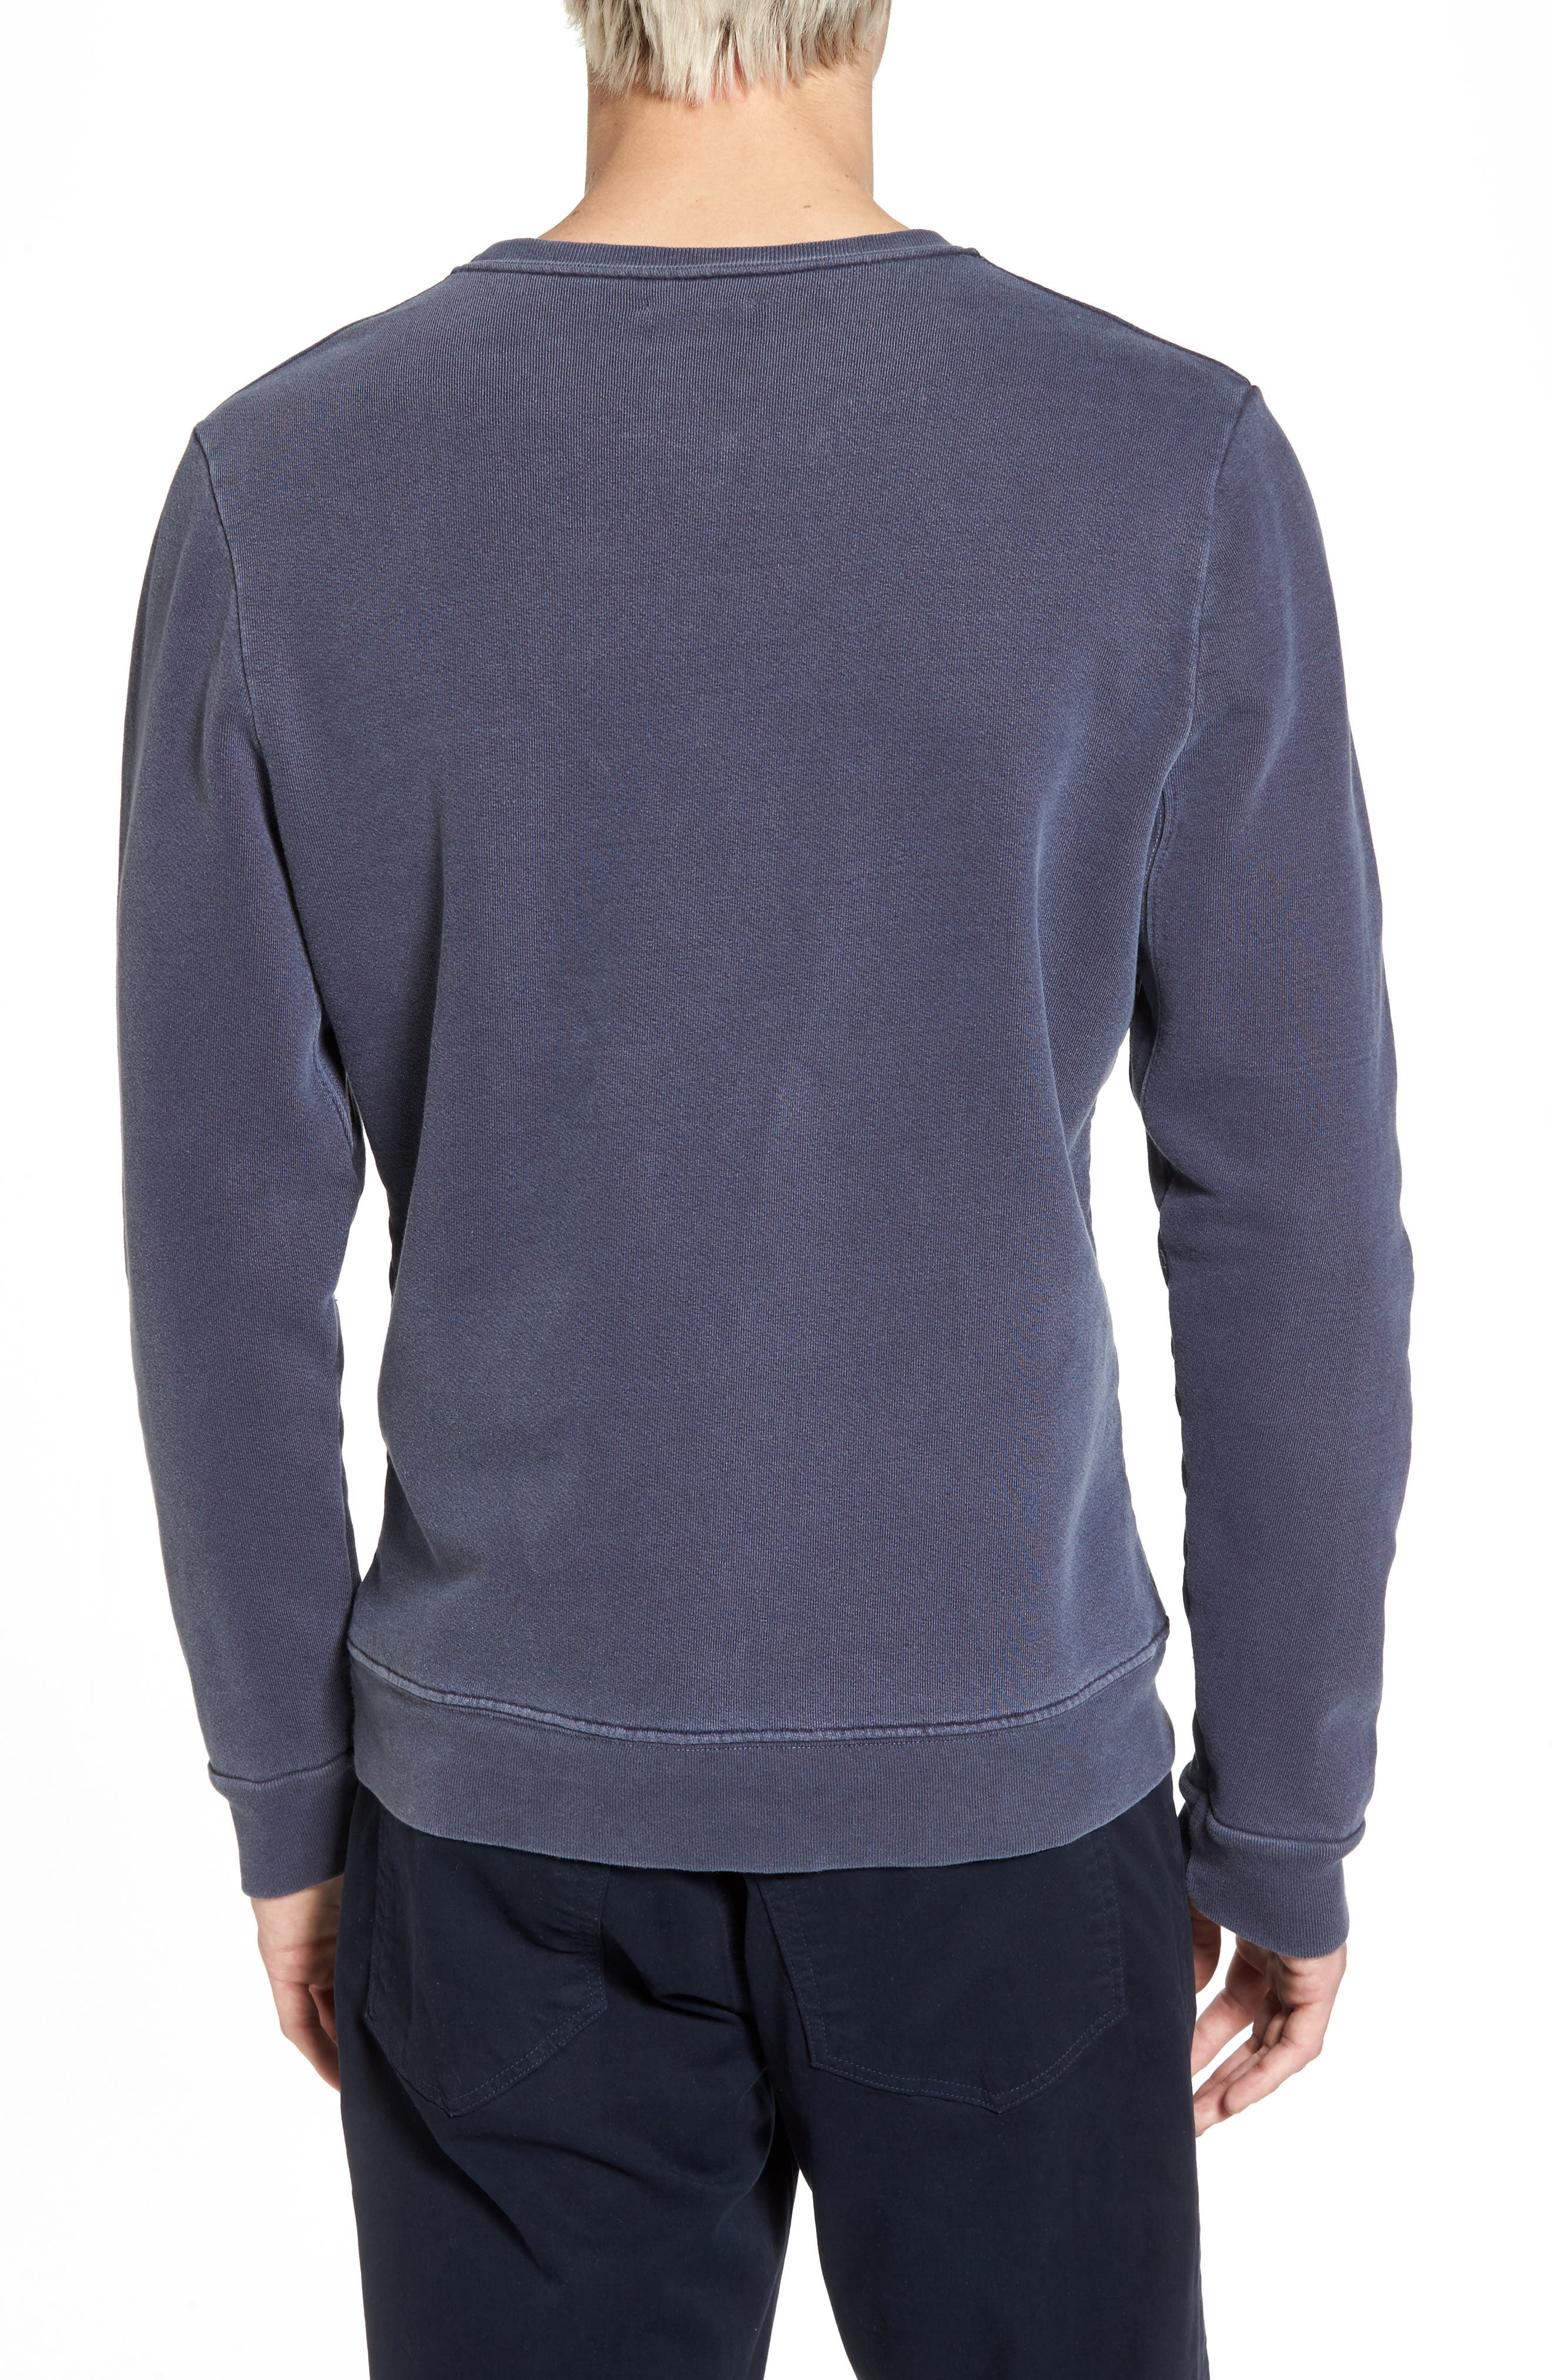 Vintage Crewneck Sweatshirt,                             Alternate thumbnail 5, color,